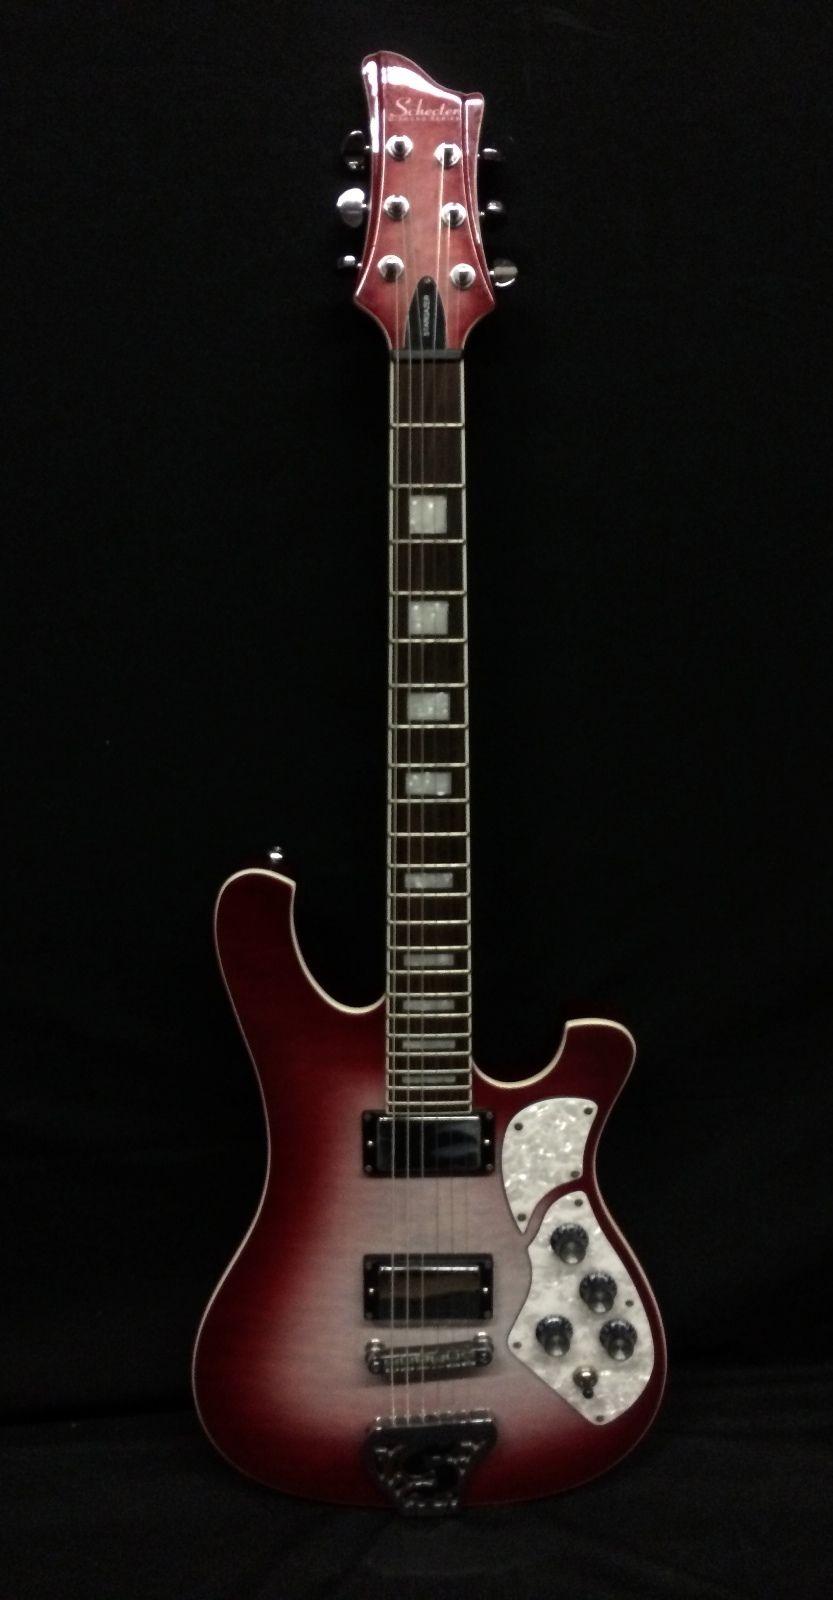 schecter stargazer electric guitar guitar collectibles guitar schecter acoustic guitar. Black Bedroom Furniture Sets. Home Design Ideas